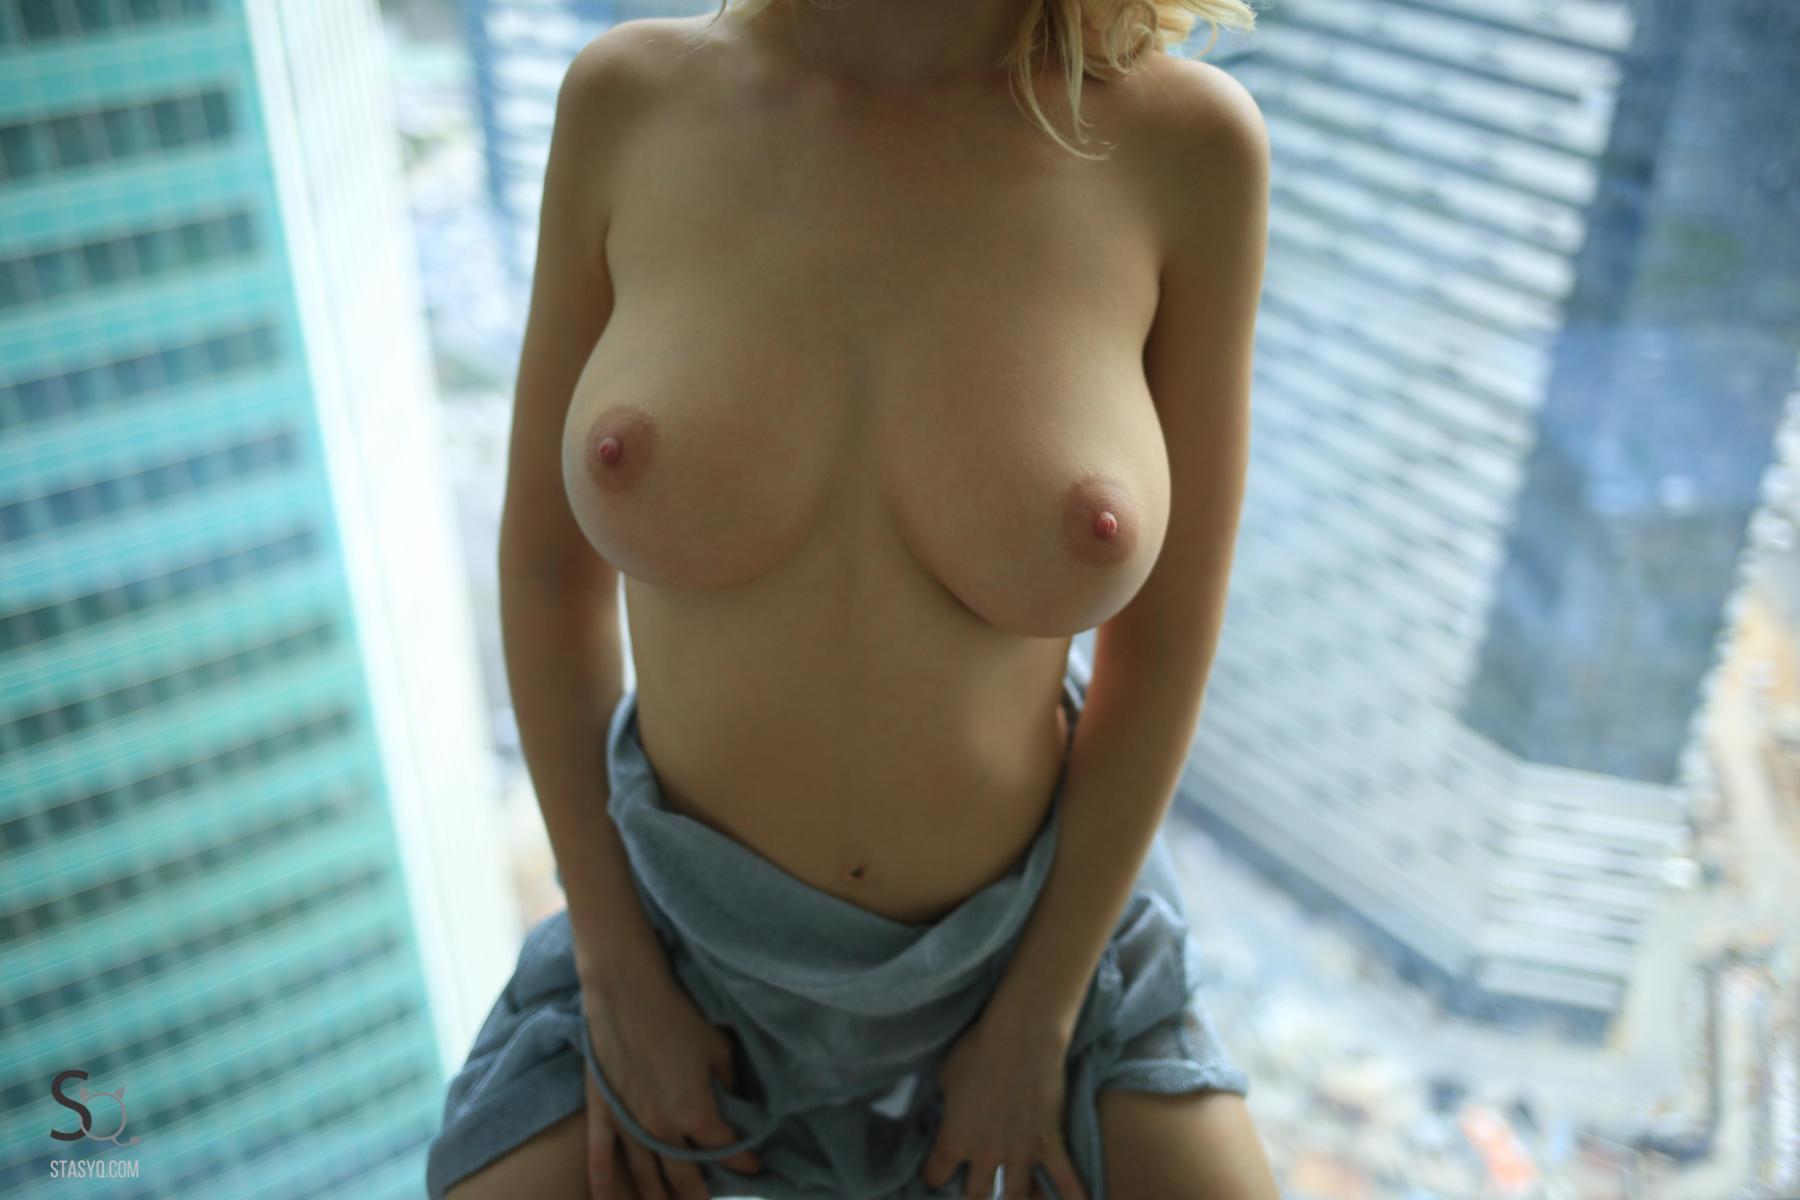 monroq-blonde-boobs-naked-bathroom-window-stasyq-10